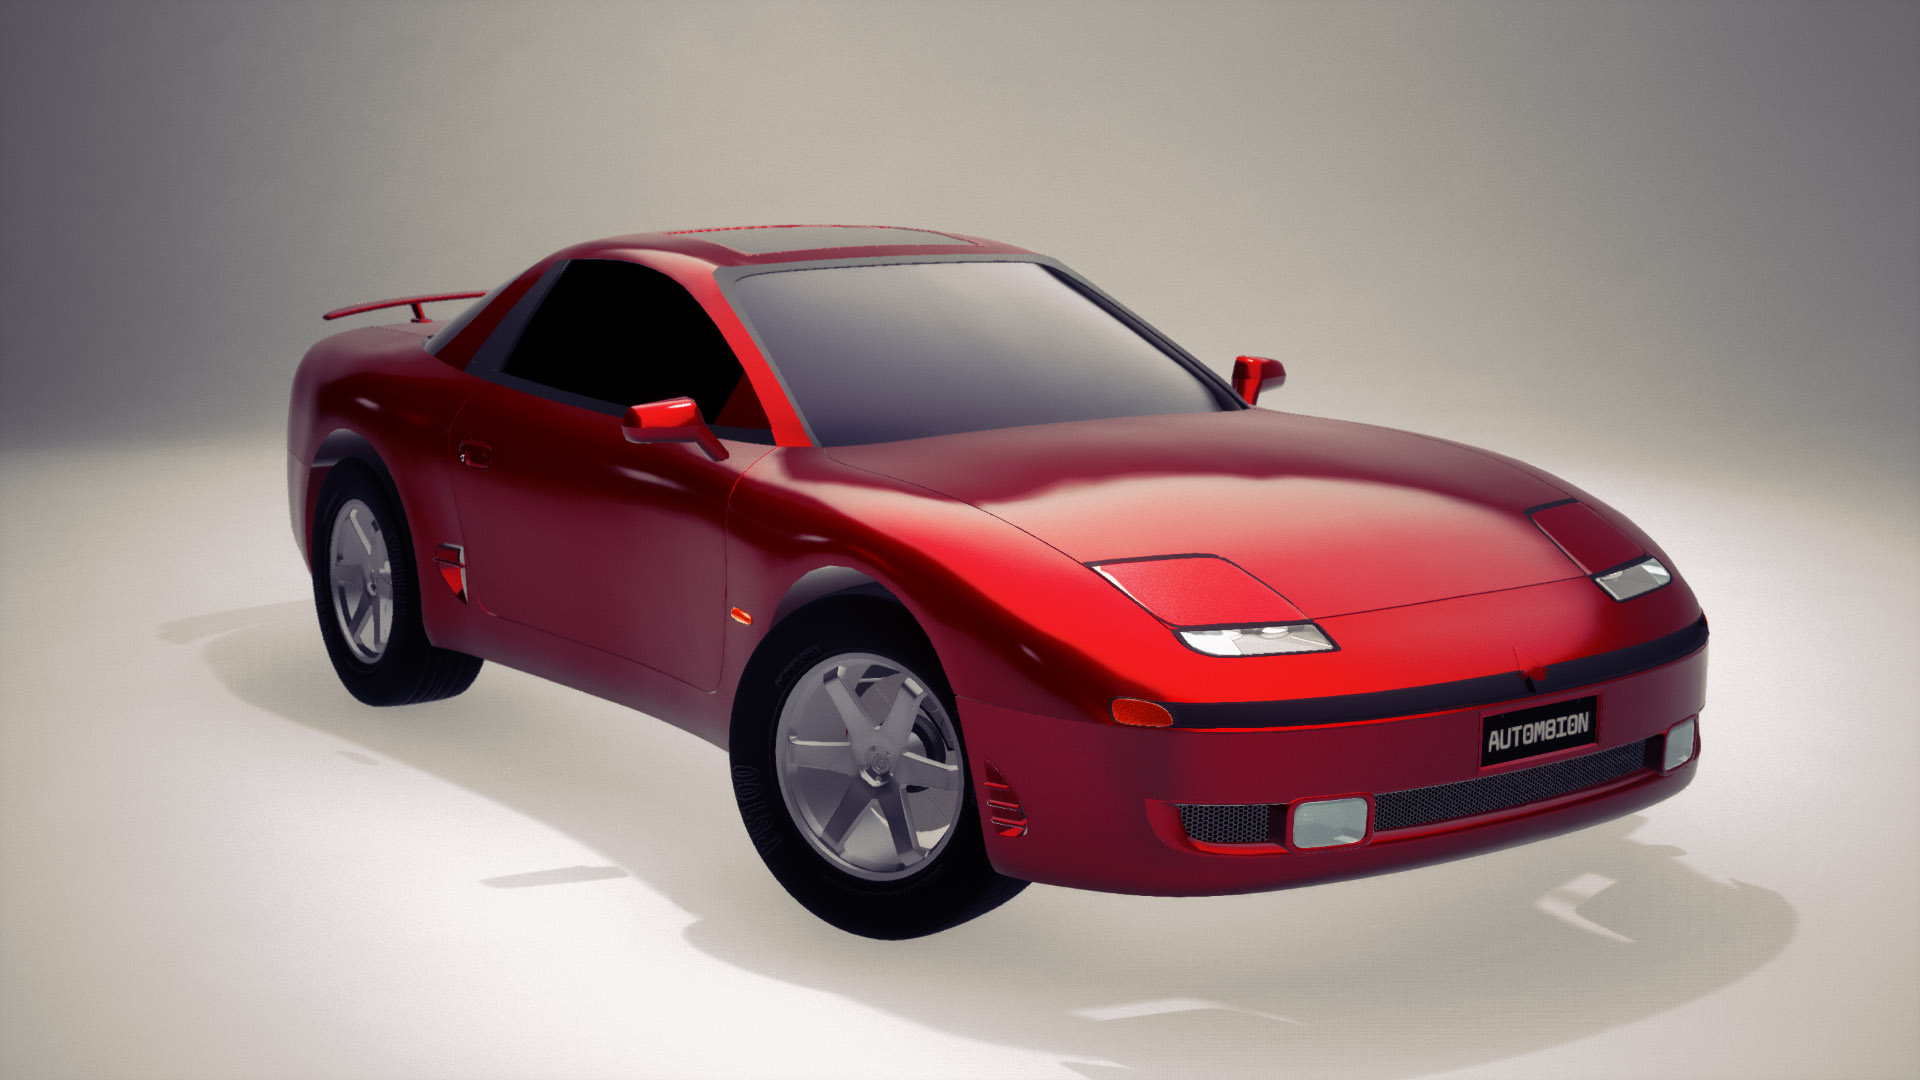 Chickenbiscuit's Mods (C4 Corvette) - Modding Forum - Automation